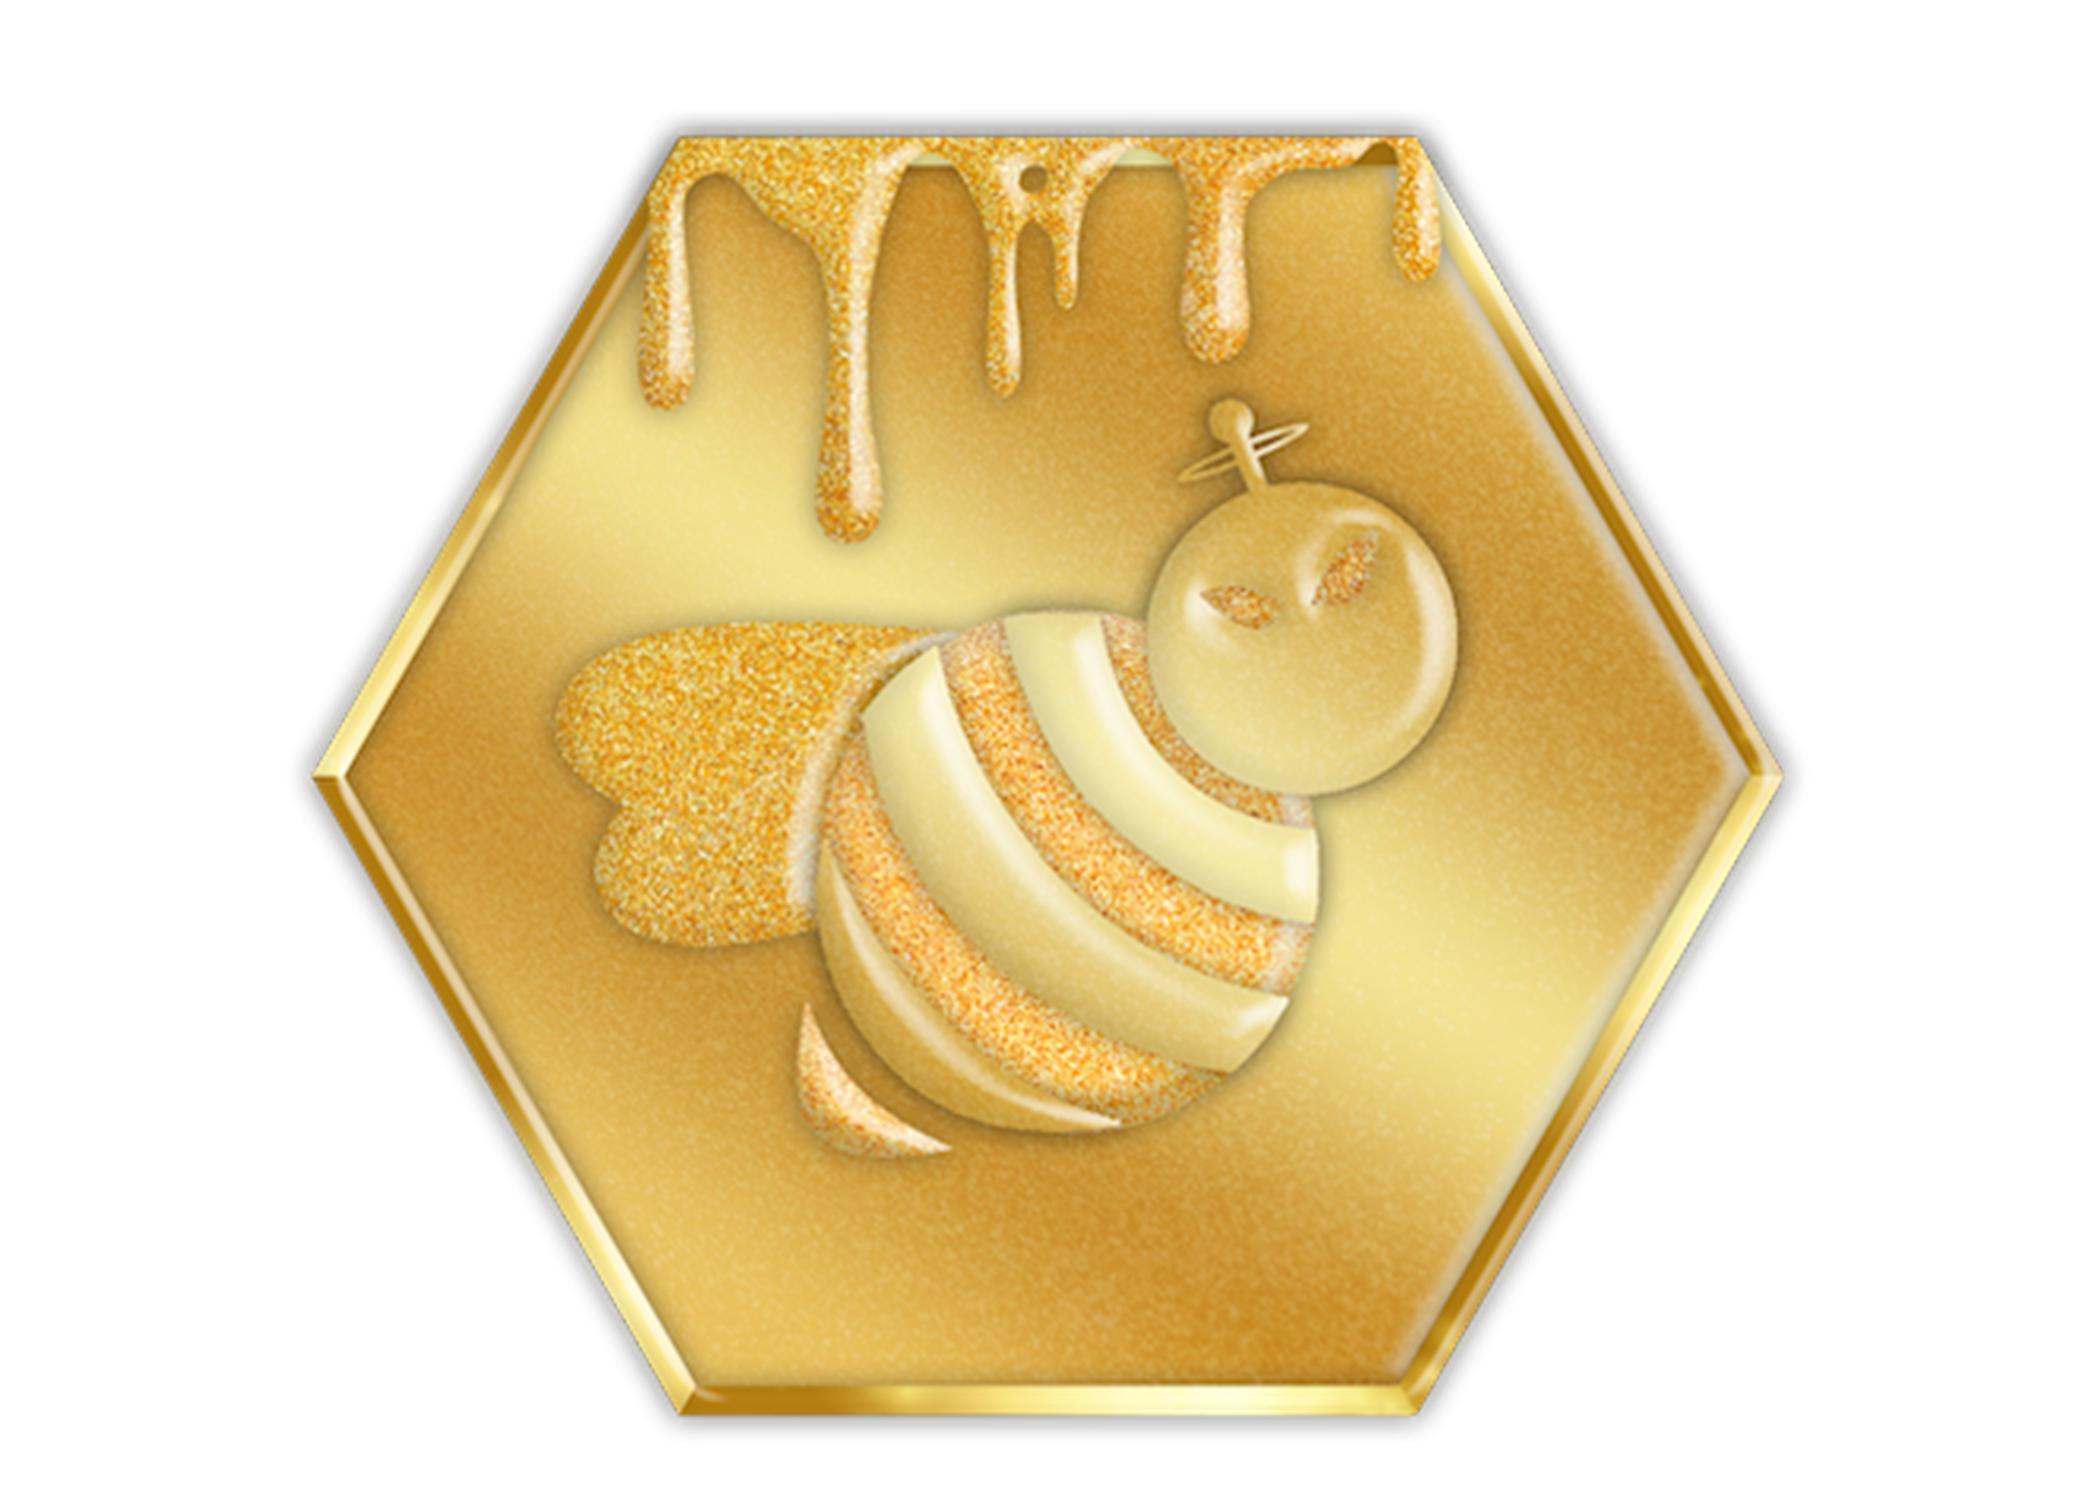 , Bizwhiznetwork Home Of The Honey Coin, #Bizwhiznetwork.com Innovation ΛI